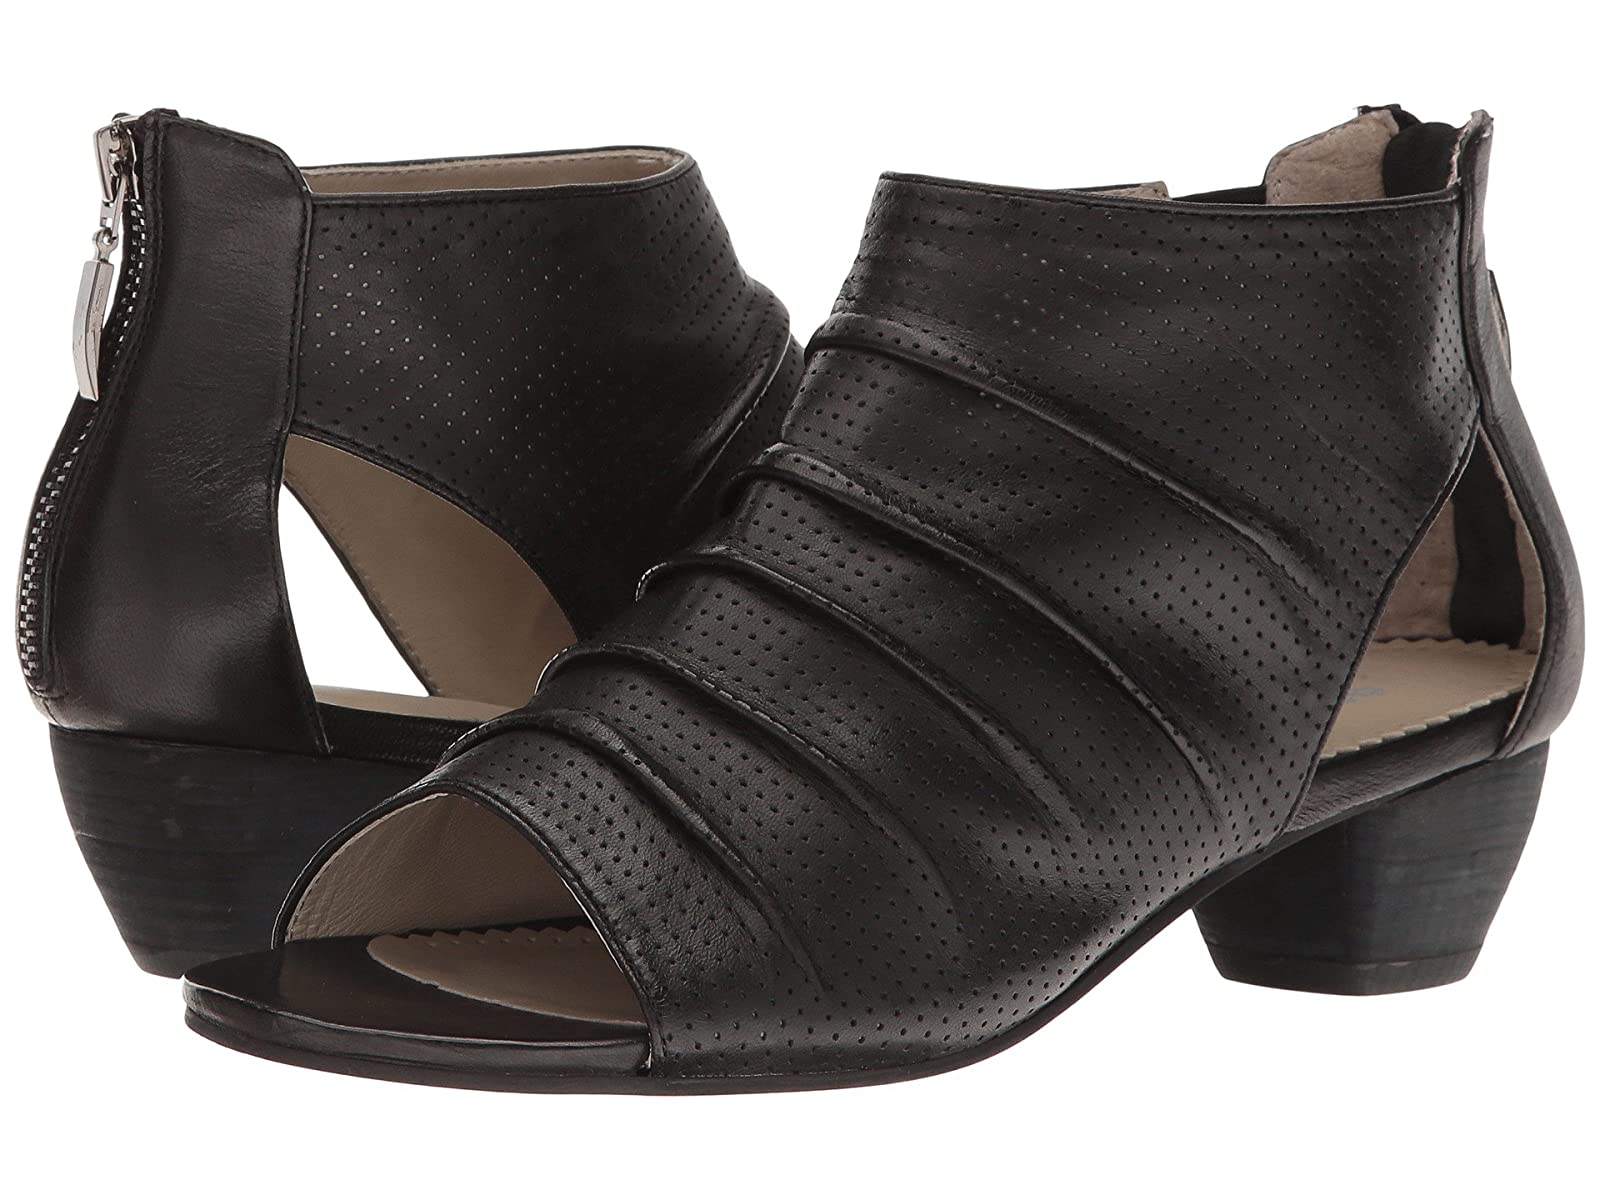 Spring Step AvidraEconomical and quality shoes